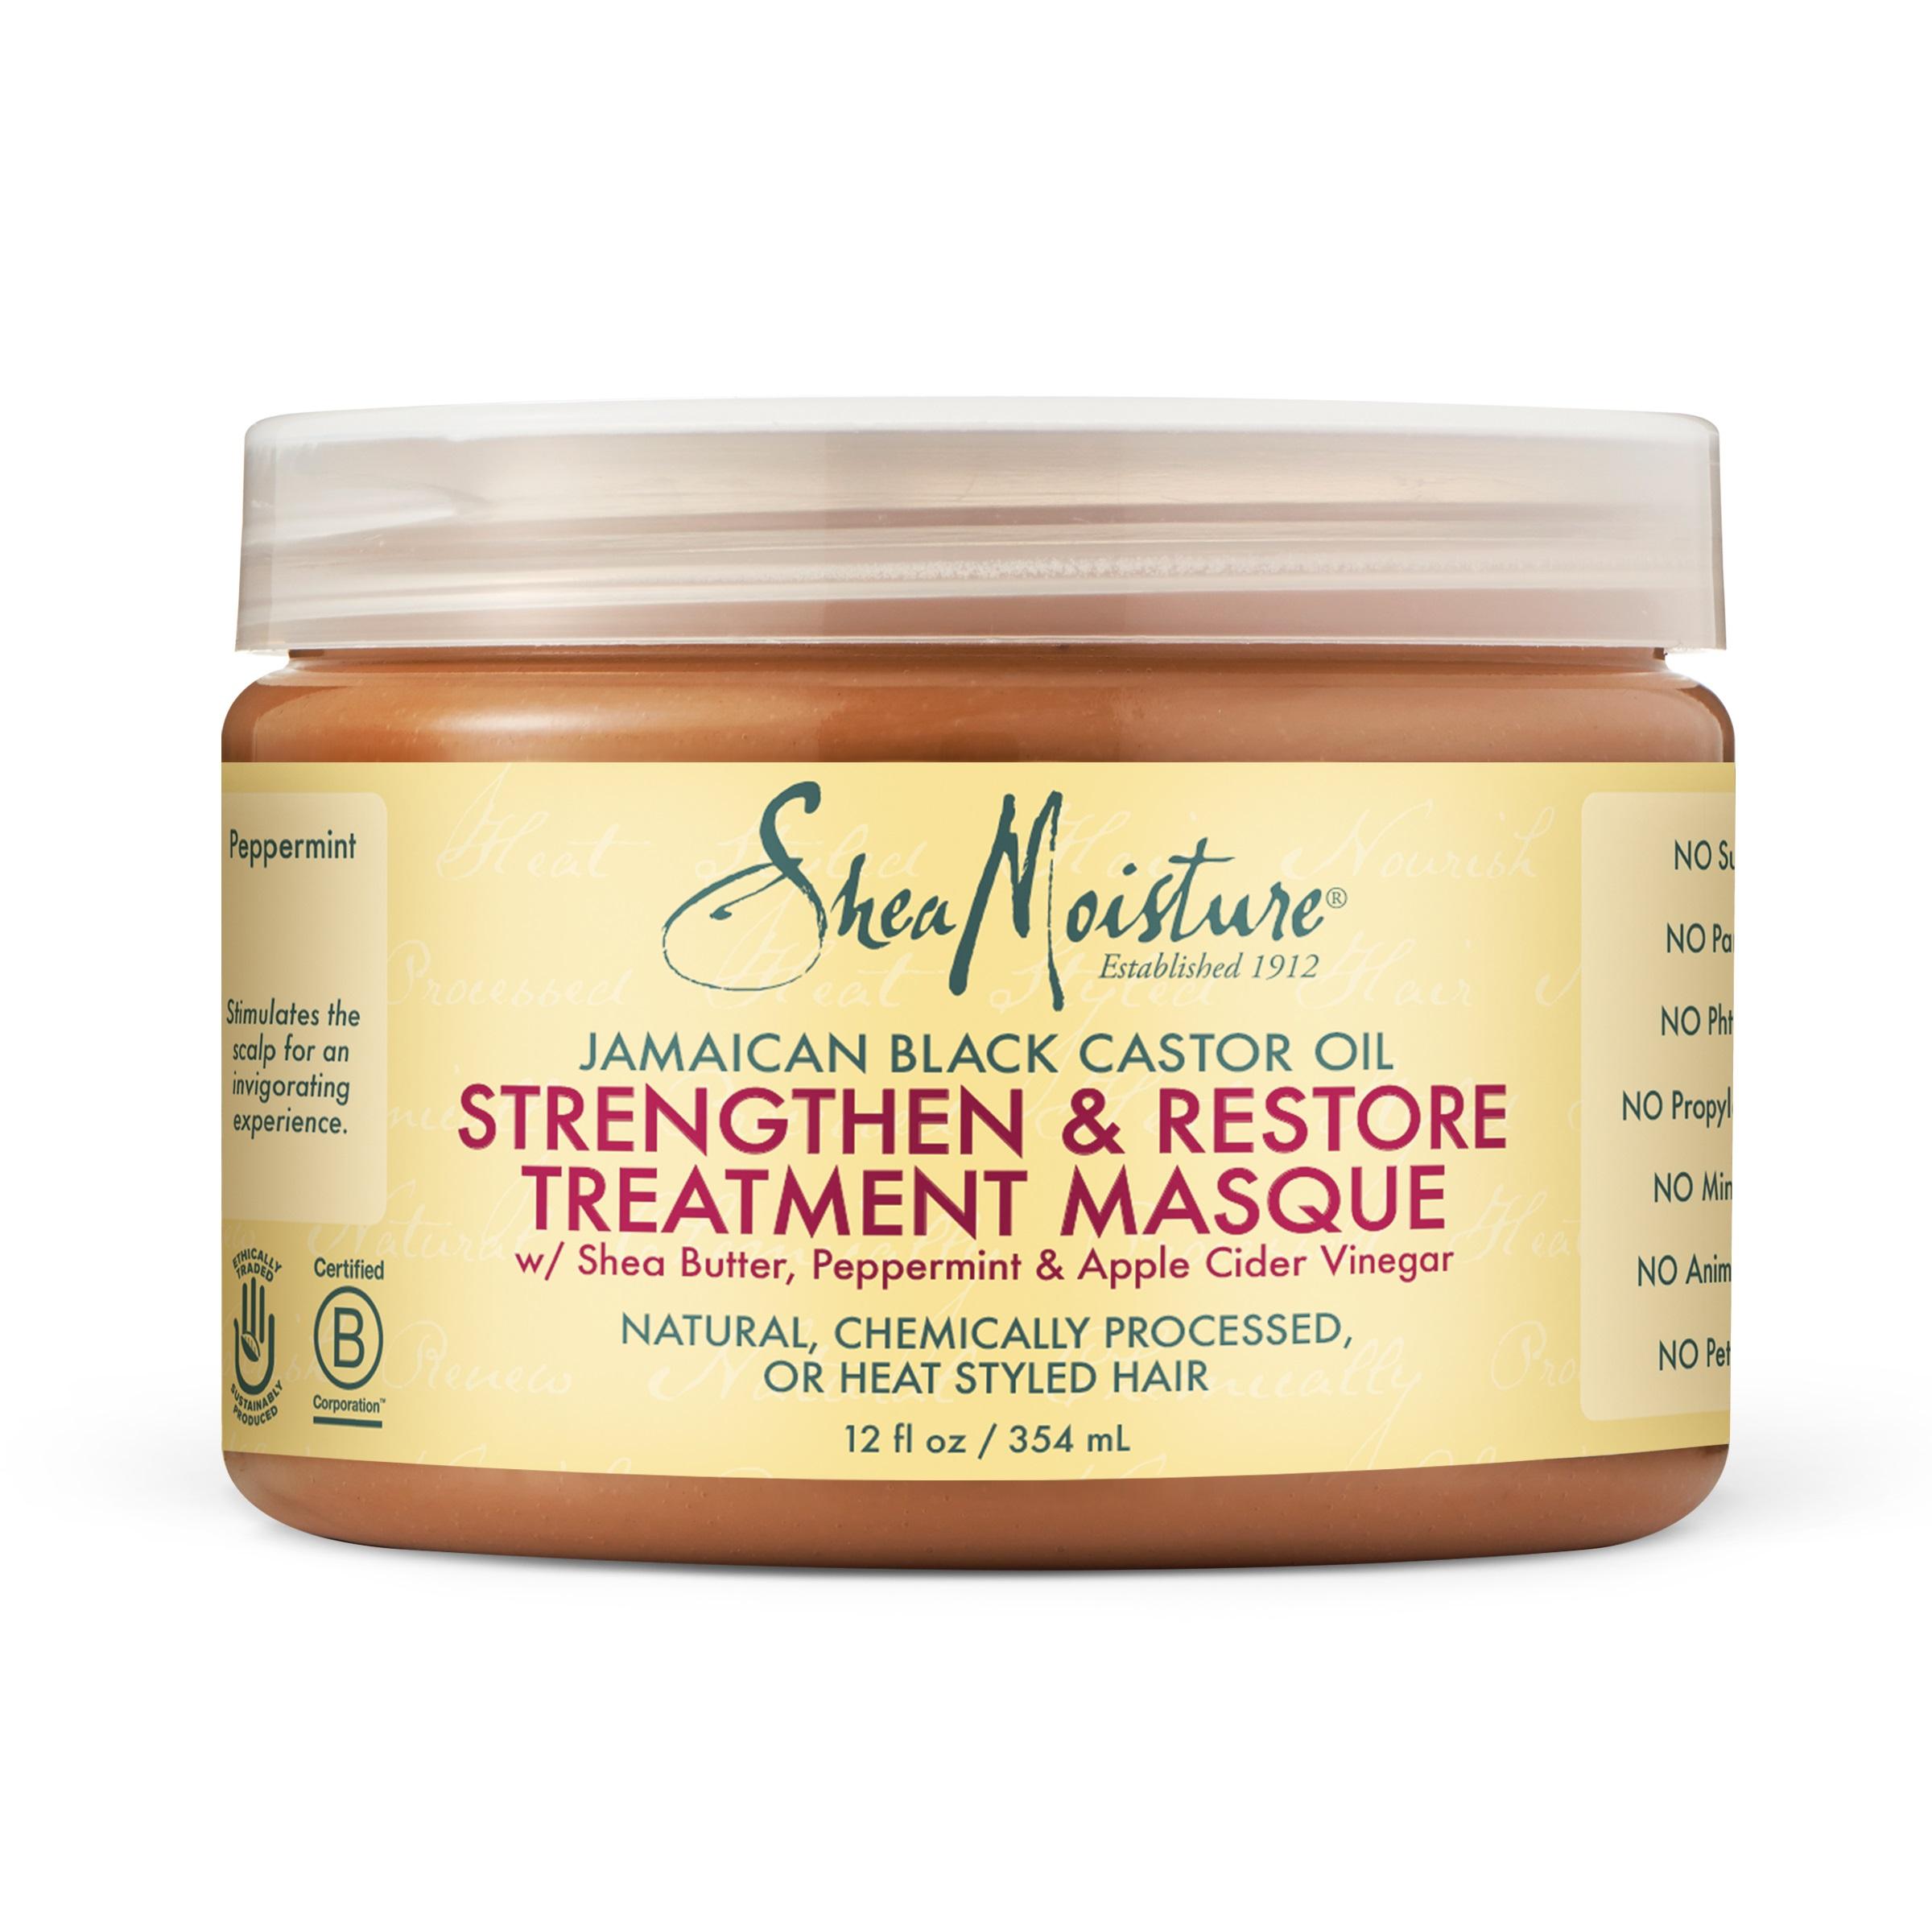 SheaMoisture Strengthen & Restore Treatment Masque